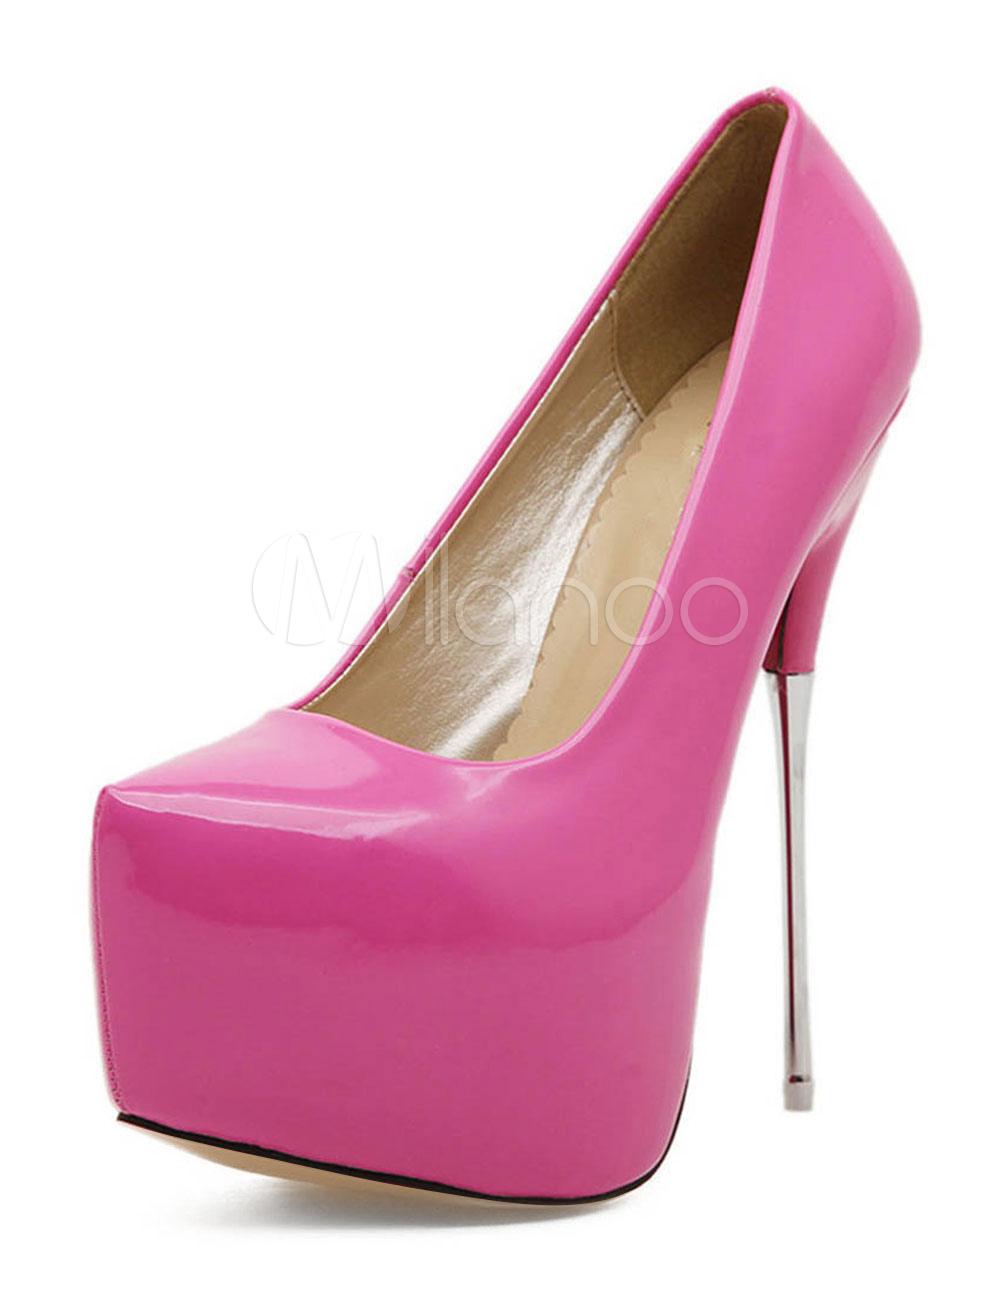 Buy Women High Heels Pointed Toe Pink Pumps Platform Heels Slip On Women Shoes for $61.19 in Milanoo store